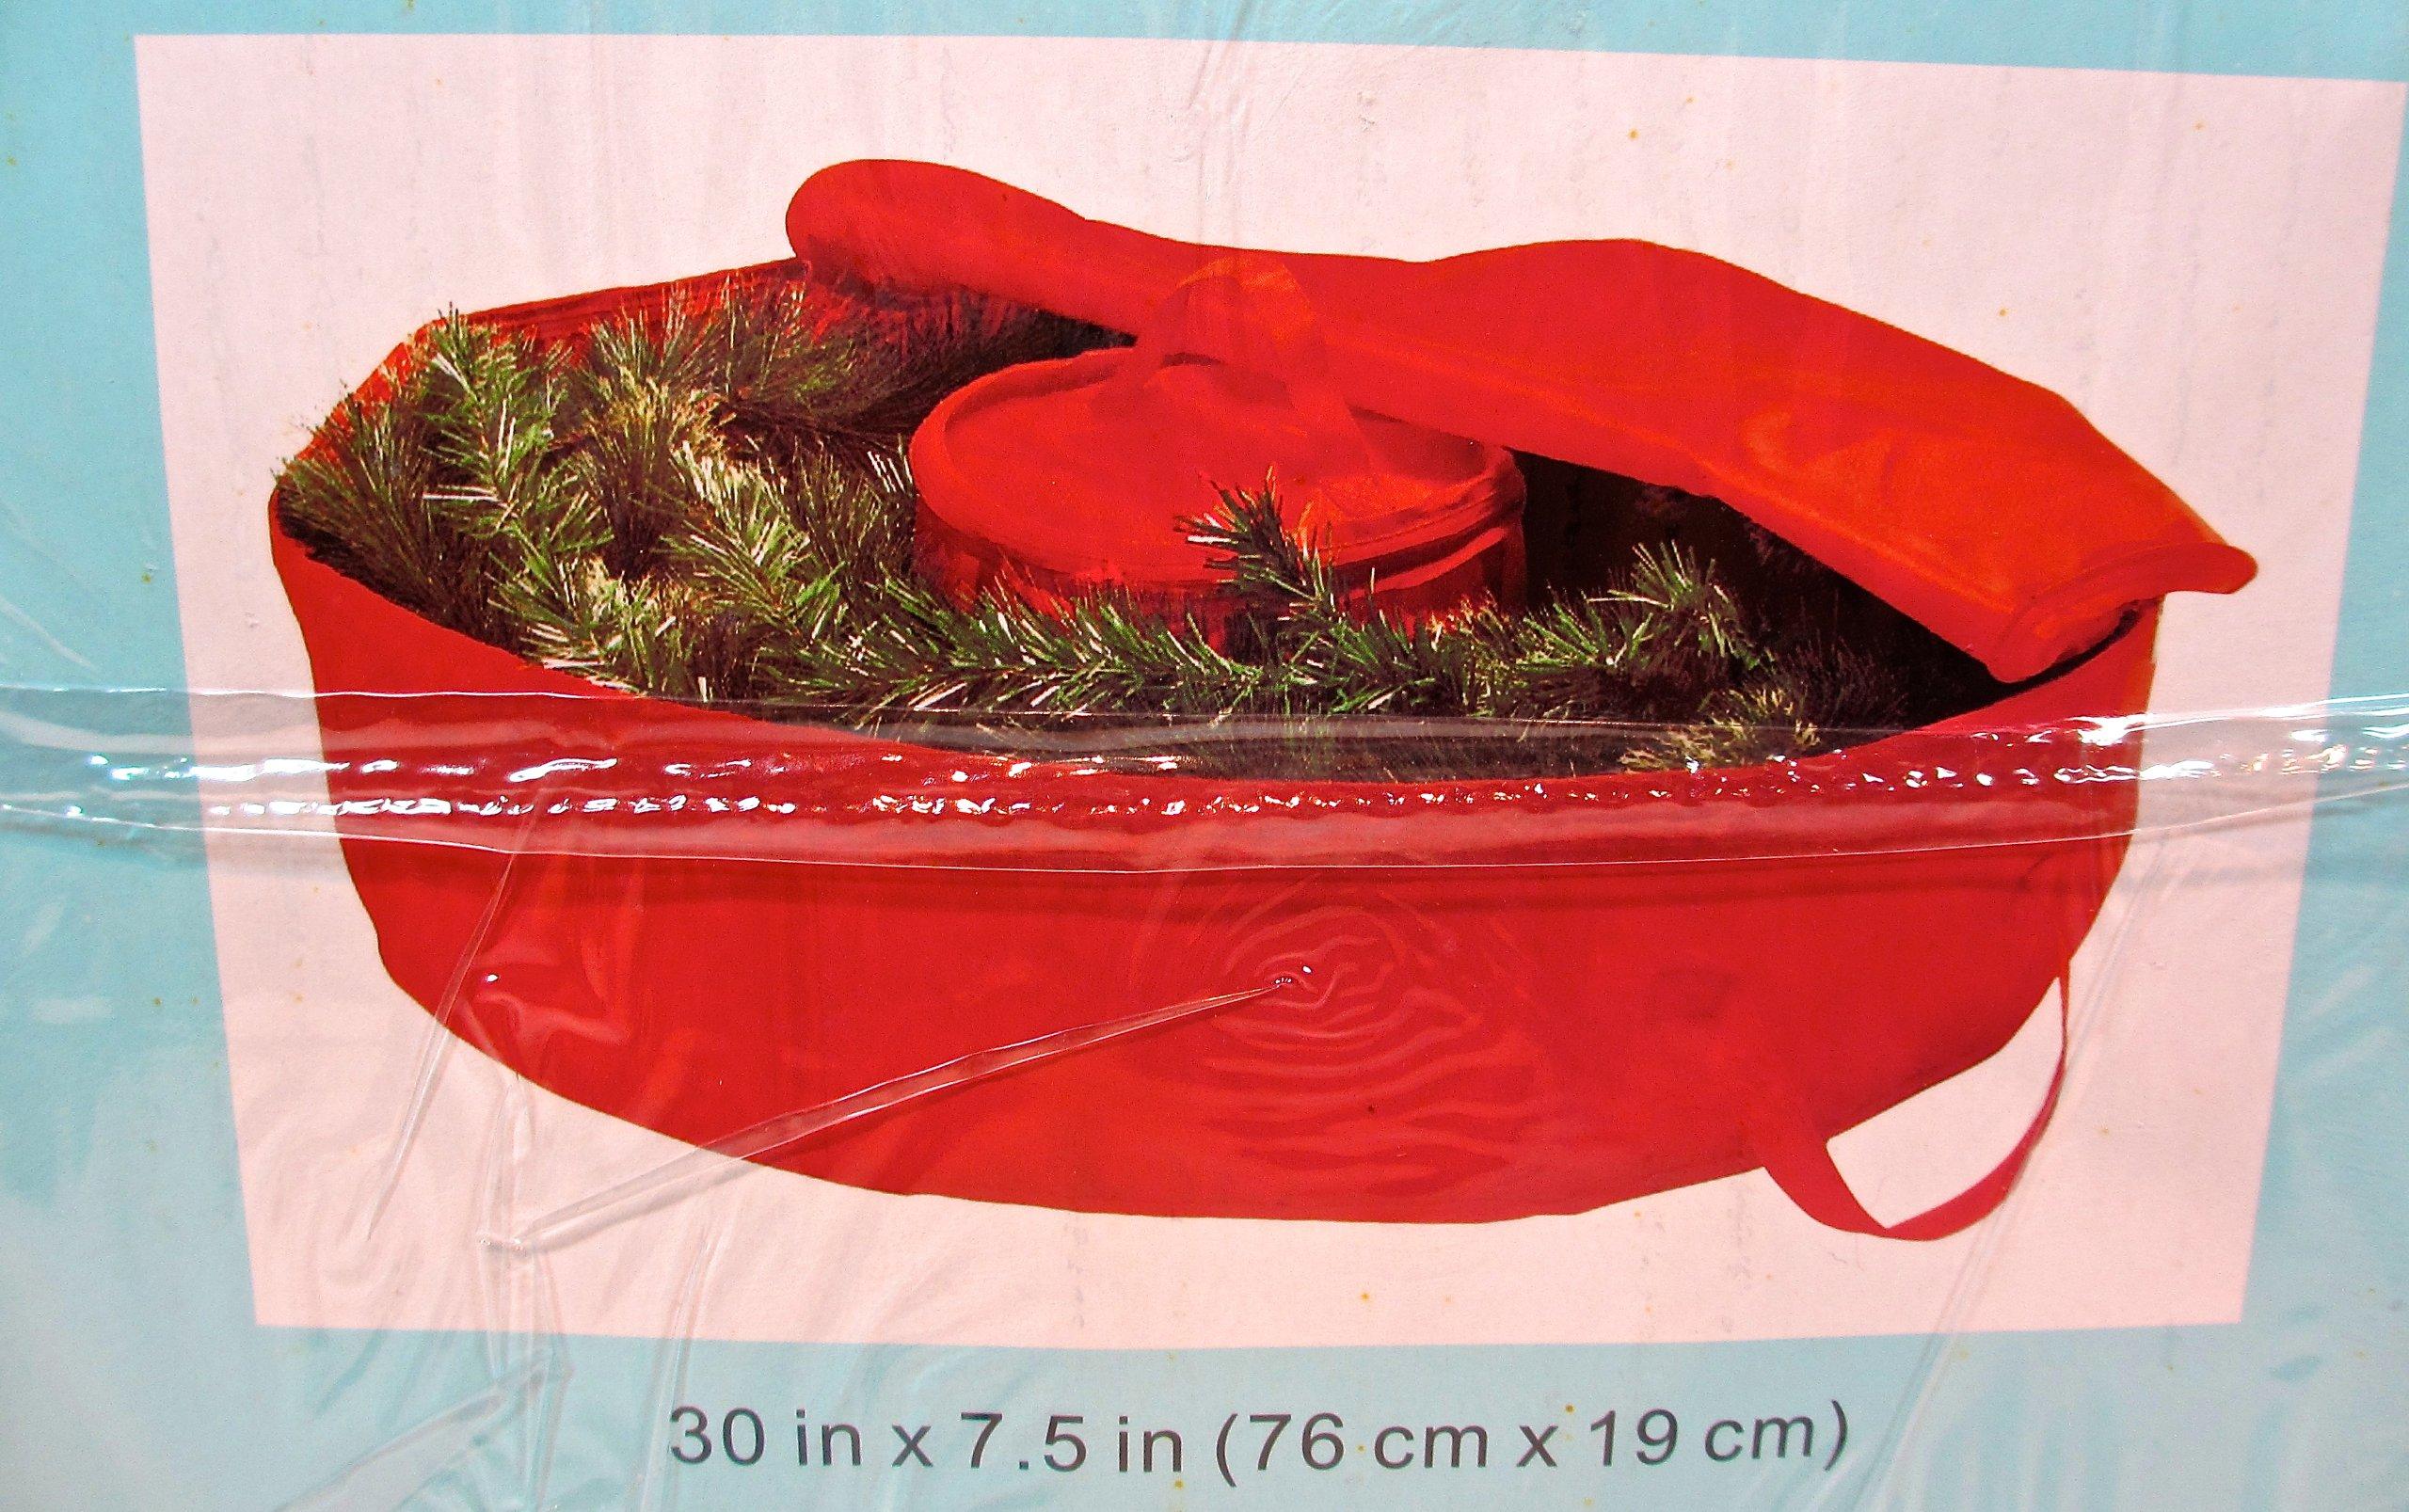 Organizing Essentials Jo-ann's Seasonal Wreath Storage Bag,handle,zipper Closure,red Polyester,30''x7.5''